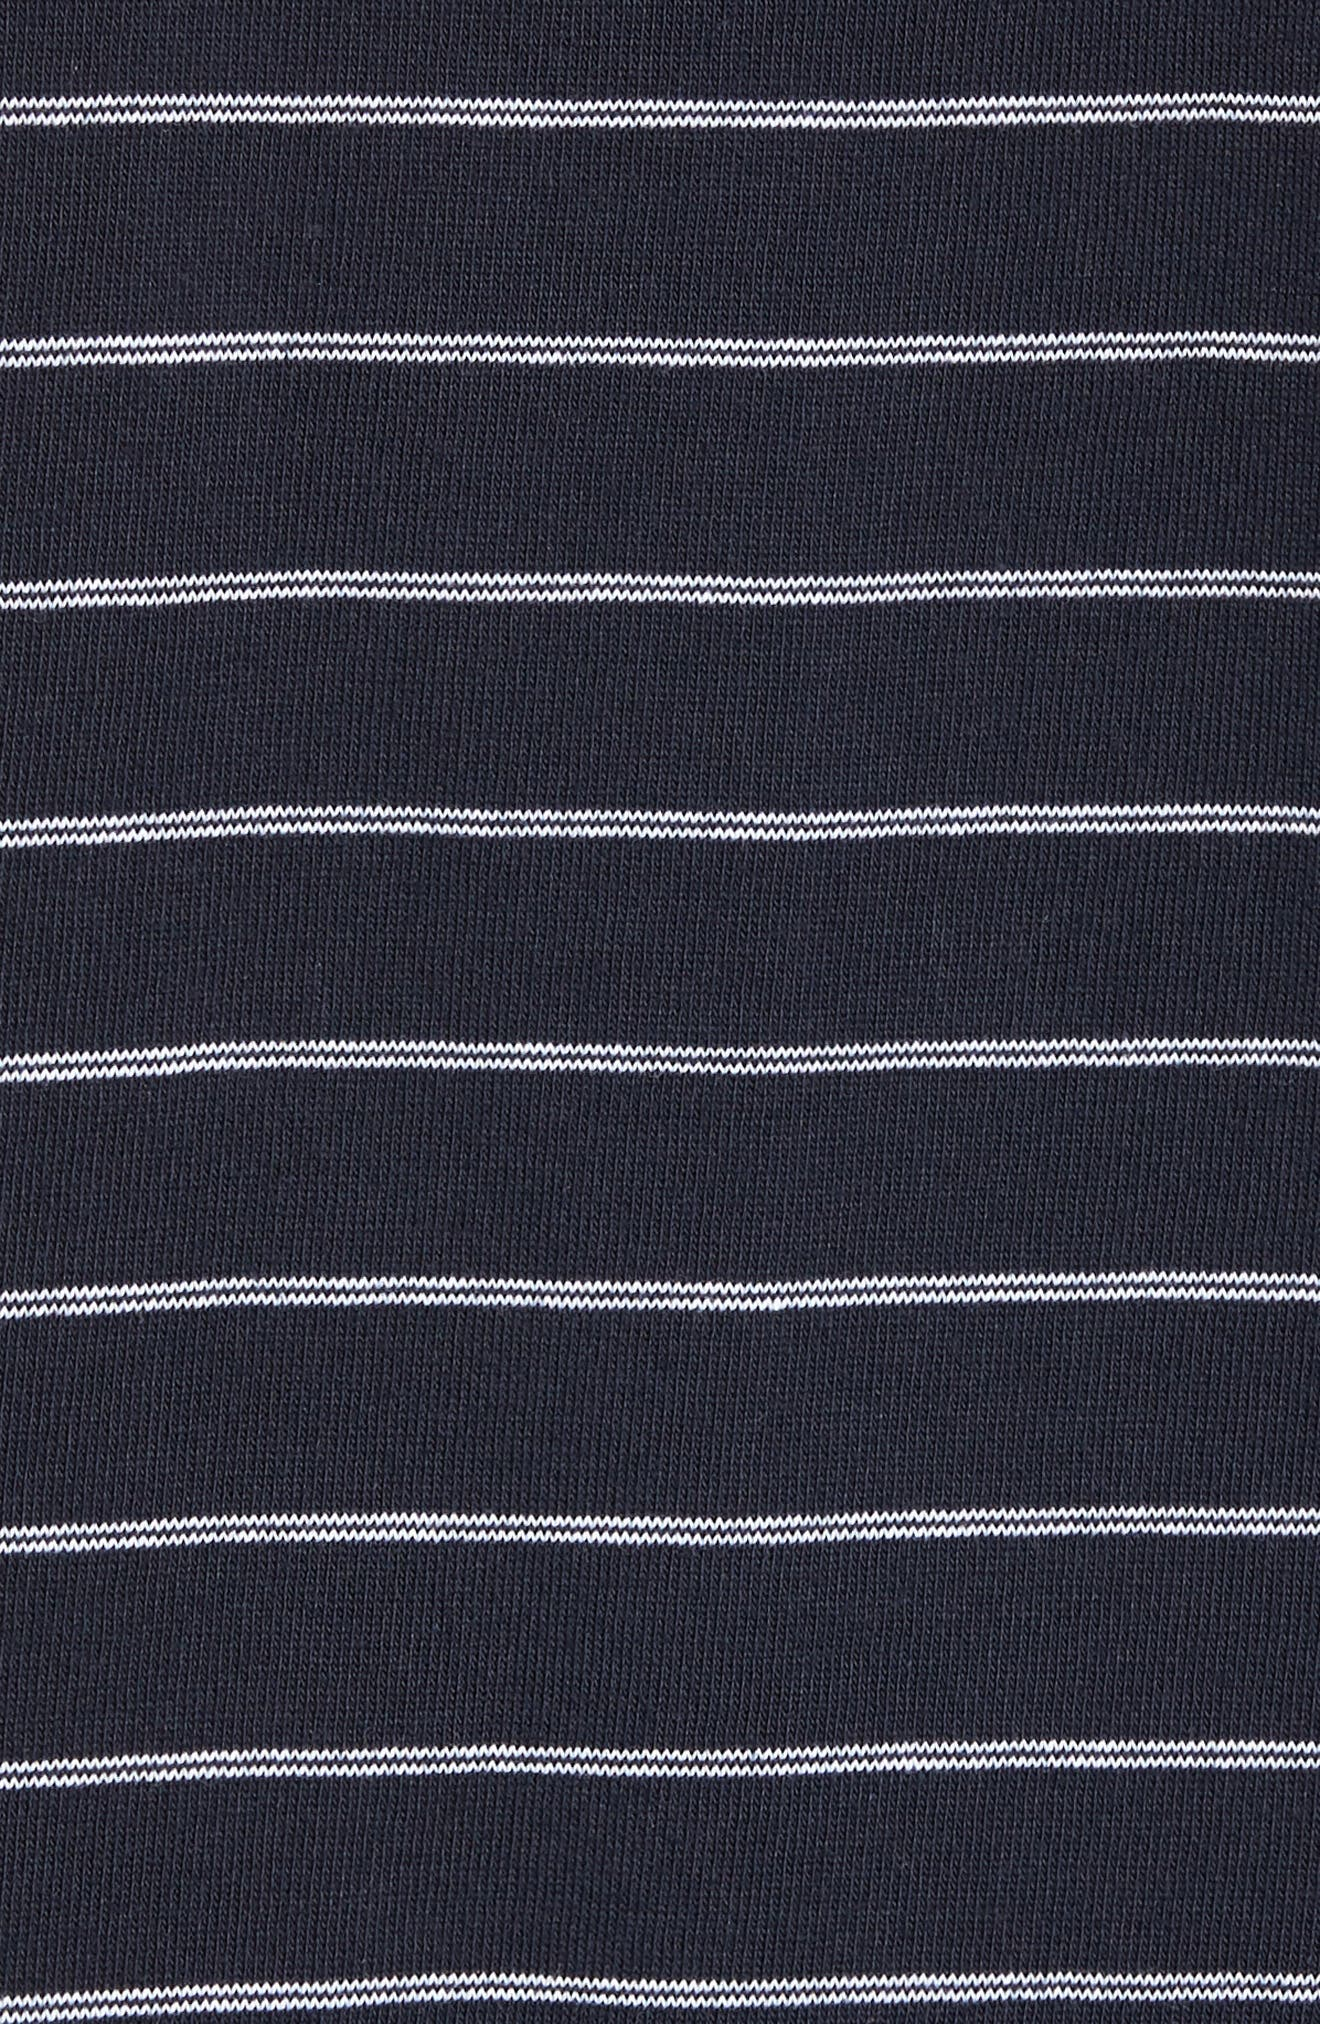 Relaxed Stripe Henley,                             Alternate thumbnail 10, color,